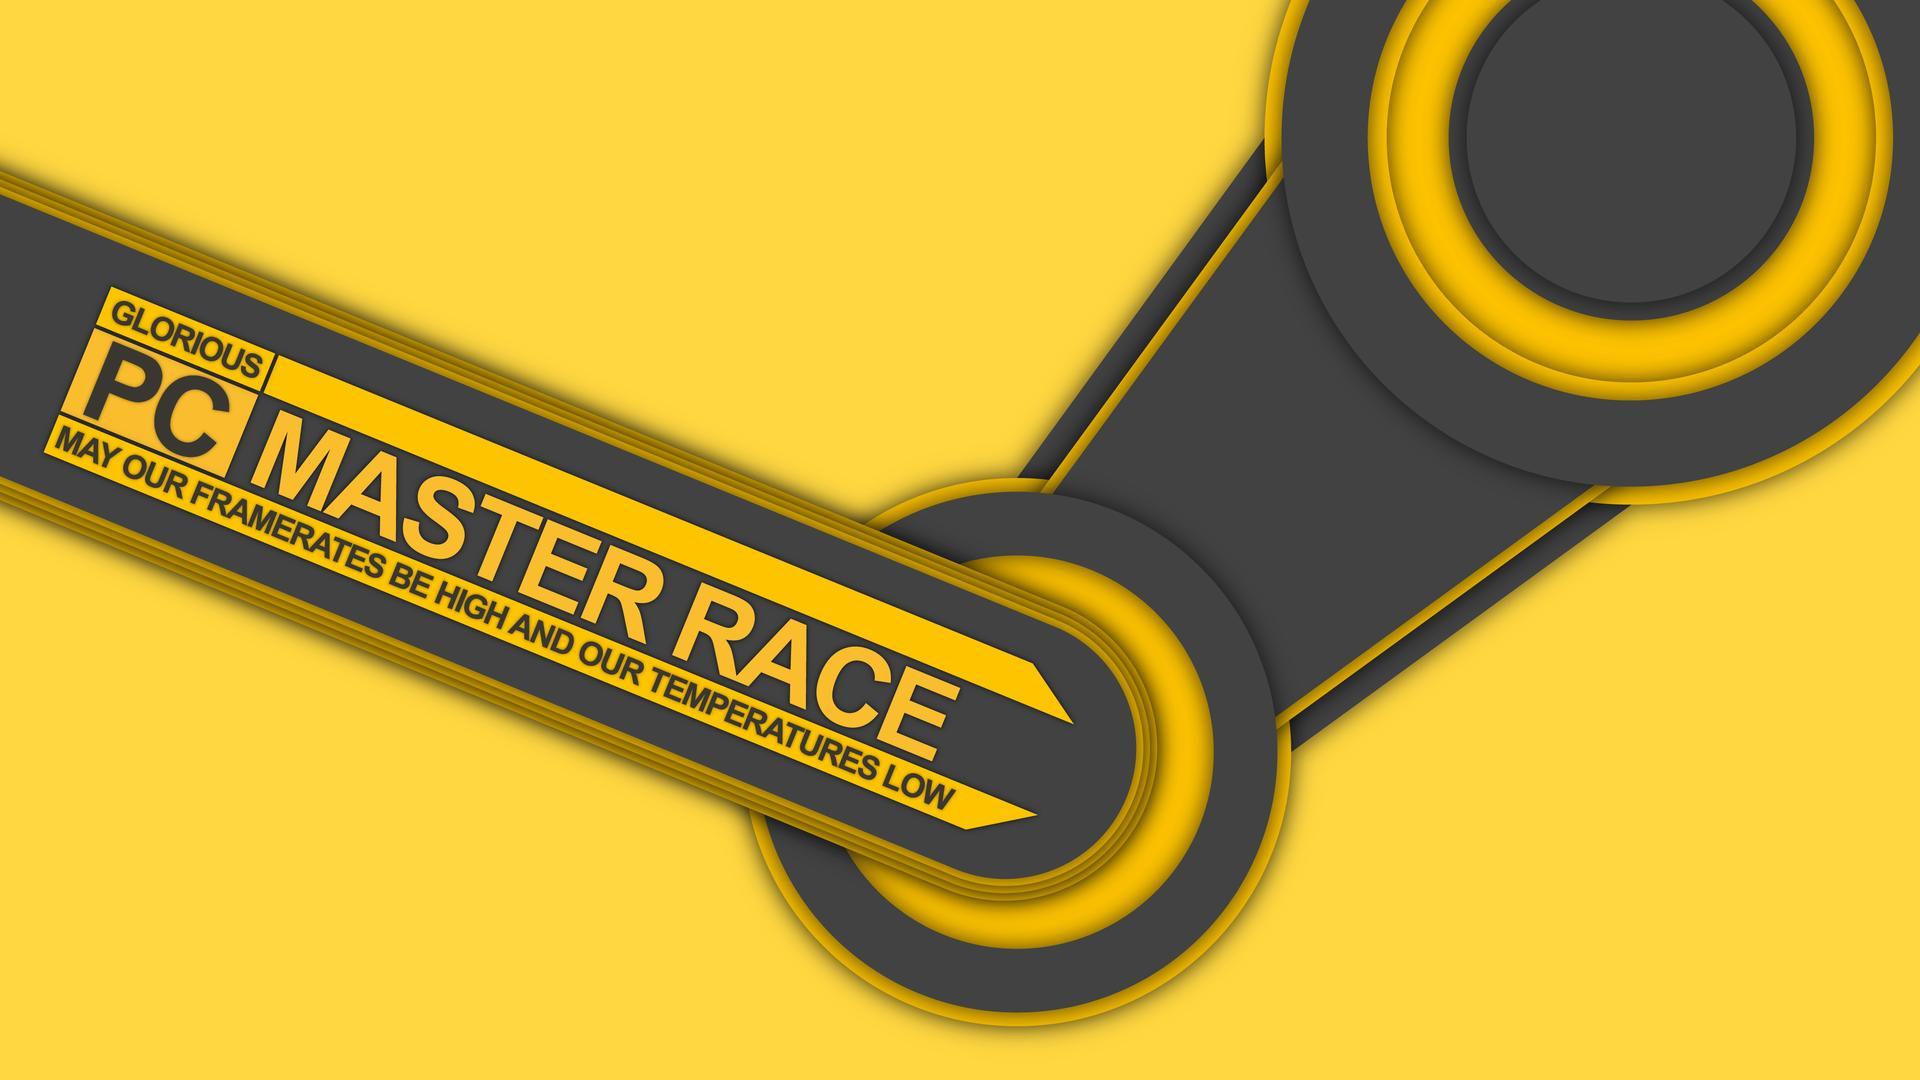 Pc Master Race Wallpaper 1920x1080: Gaming PC Master Race Wallpaper Wallpaper Download 1920x1080